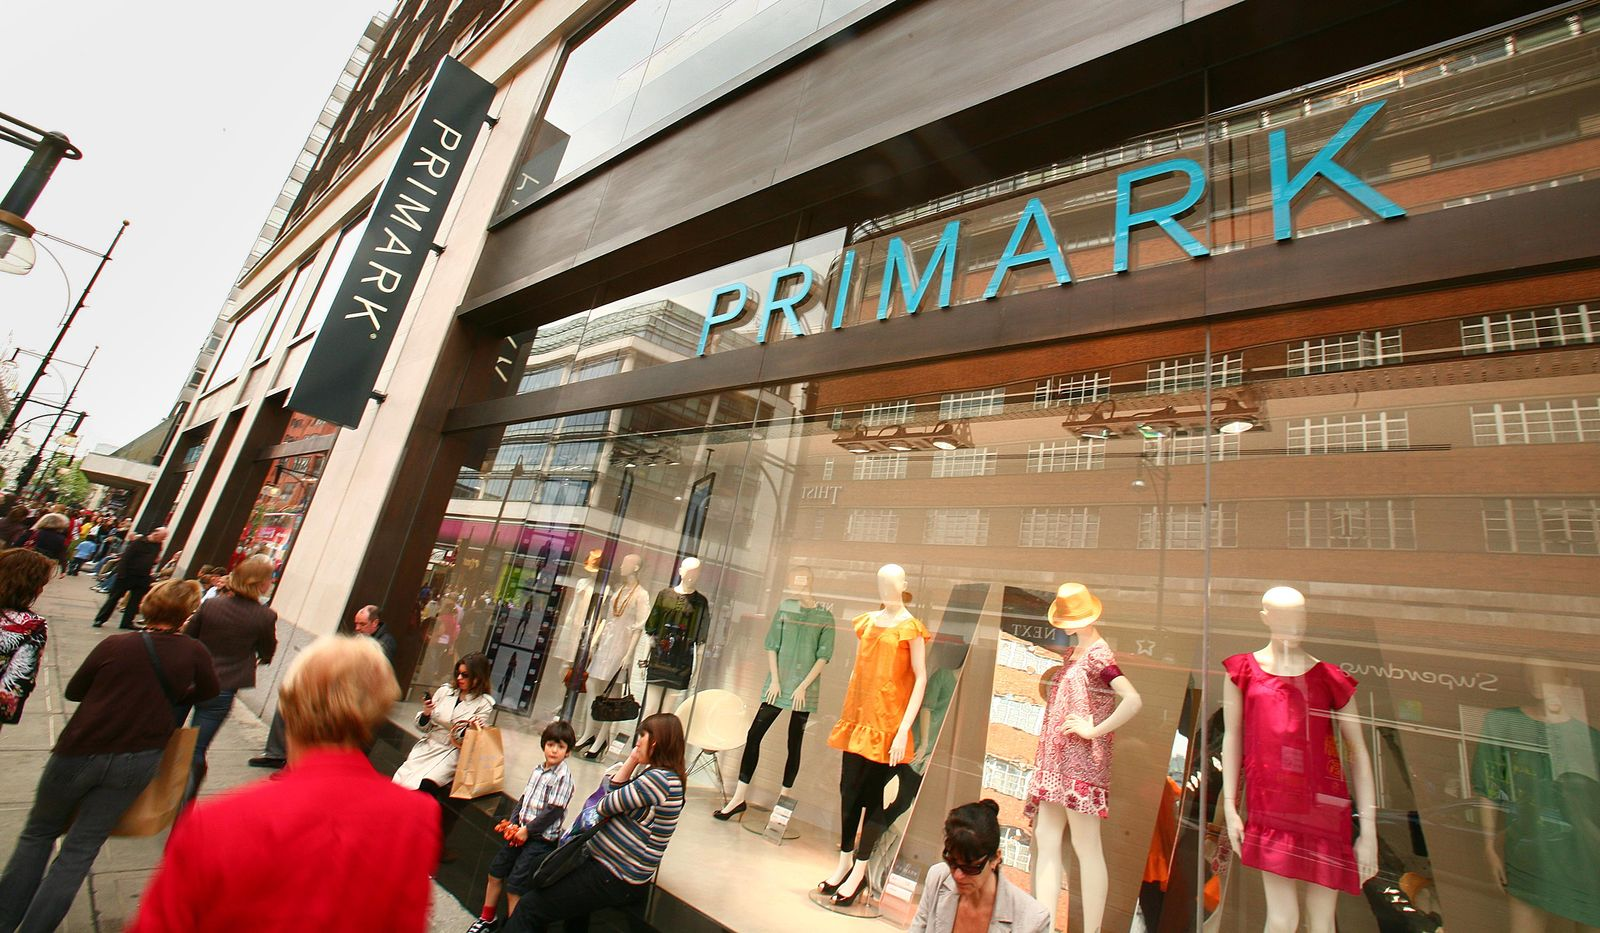 Primark in London / Mode / Modeketten